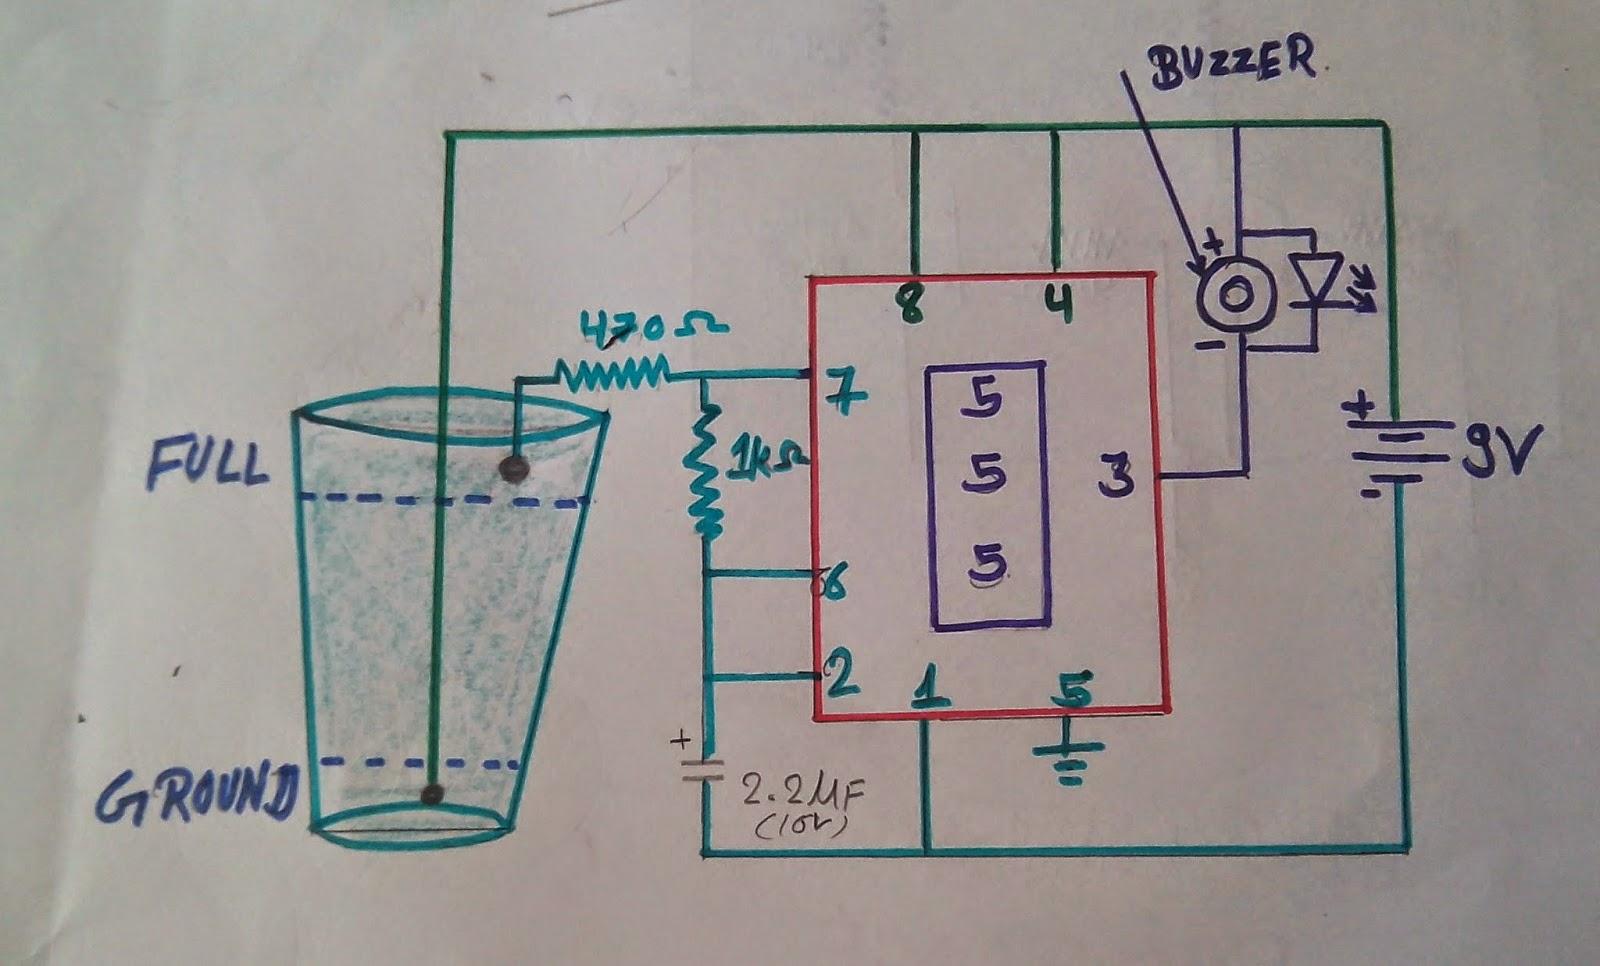 Buzzertypecircuitg schematic diagram of water level indicator pooptronica Gallery